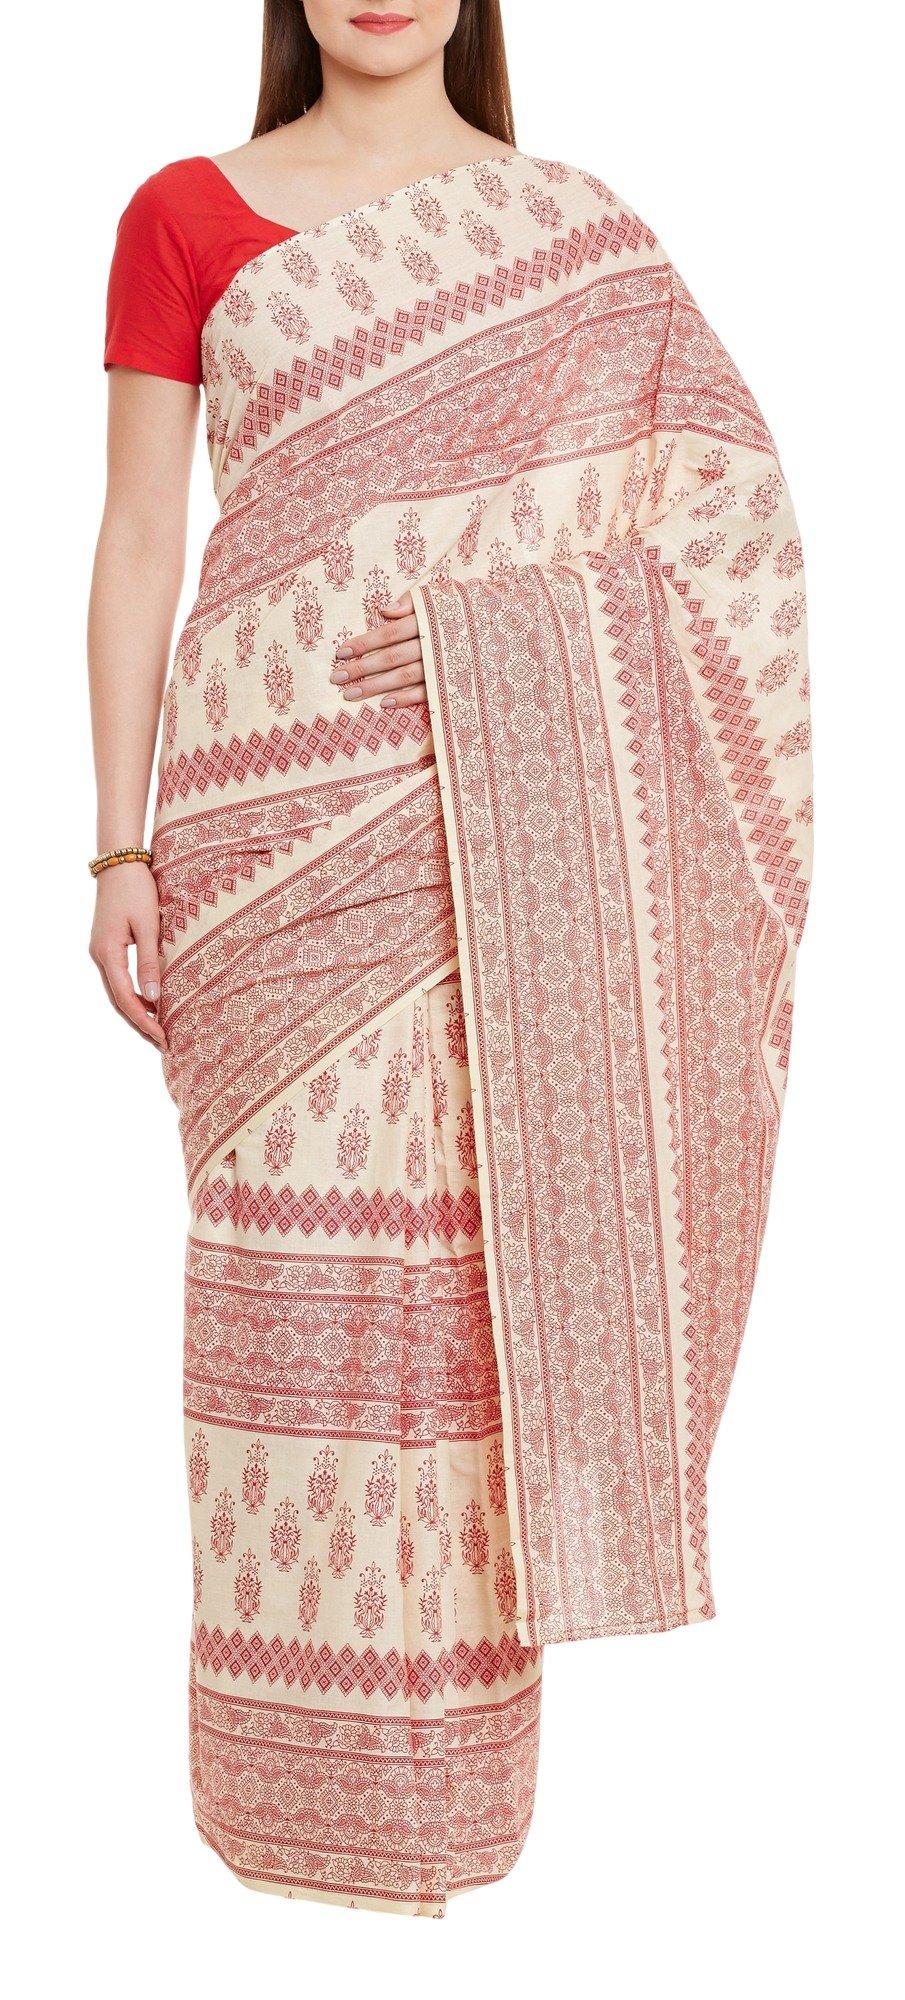 Women's Indian Warli Print Art Saree Cotton Set of 3 Sari Blouse Petticoat Skirt,W-CSR0336-5002